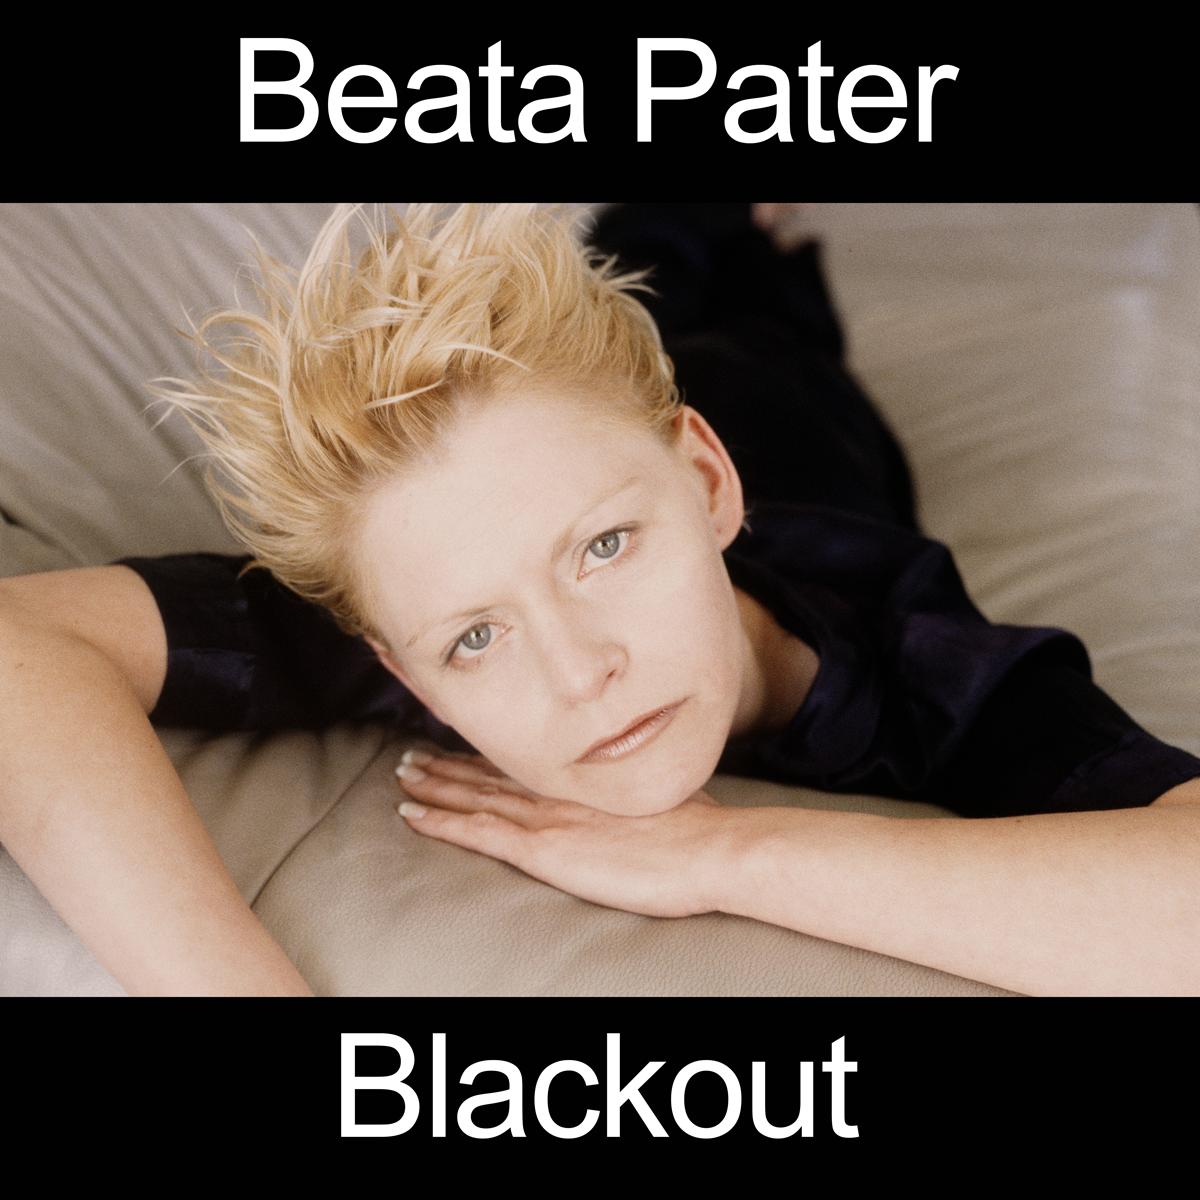 Beata Pater's Blackout album cover